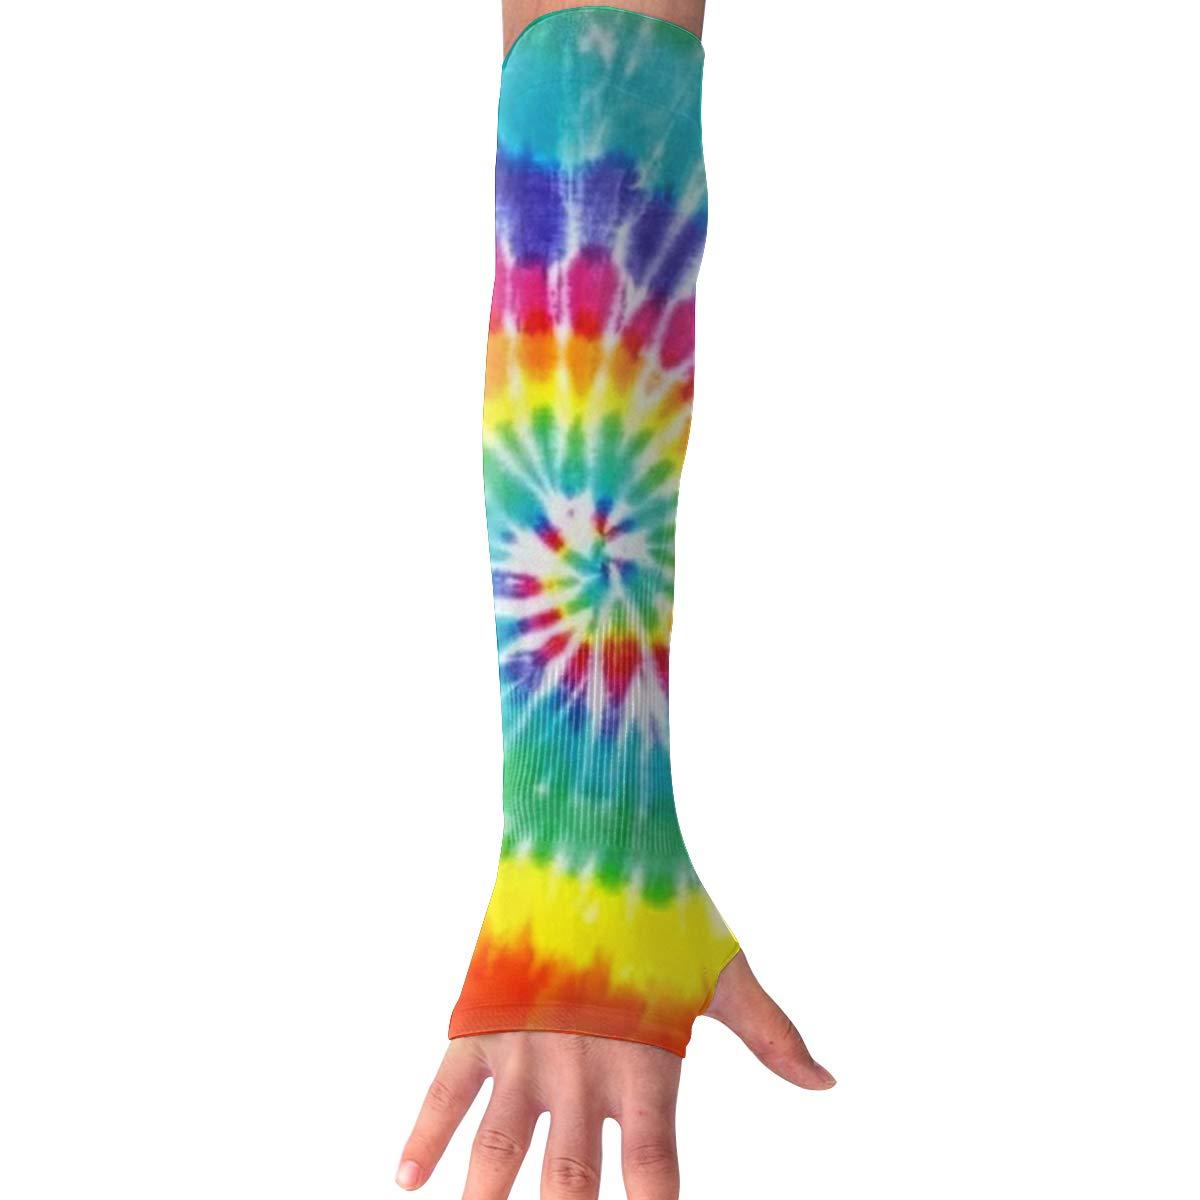 Field Rain Arm Cooling Sleeves Tye Dye UV Sun Protection Arm Cover Hand Covers